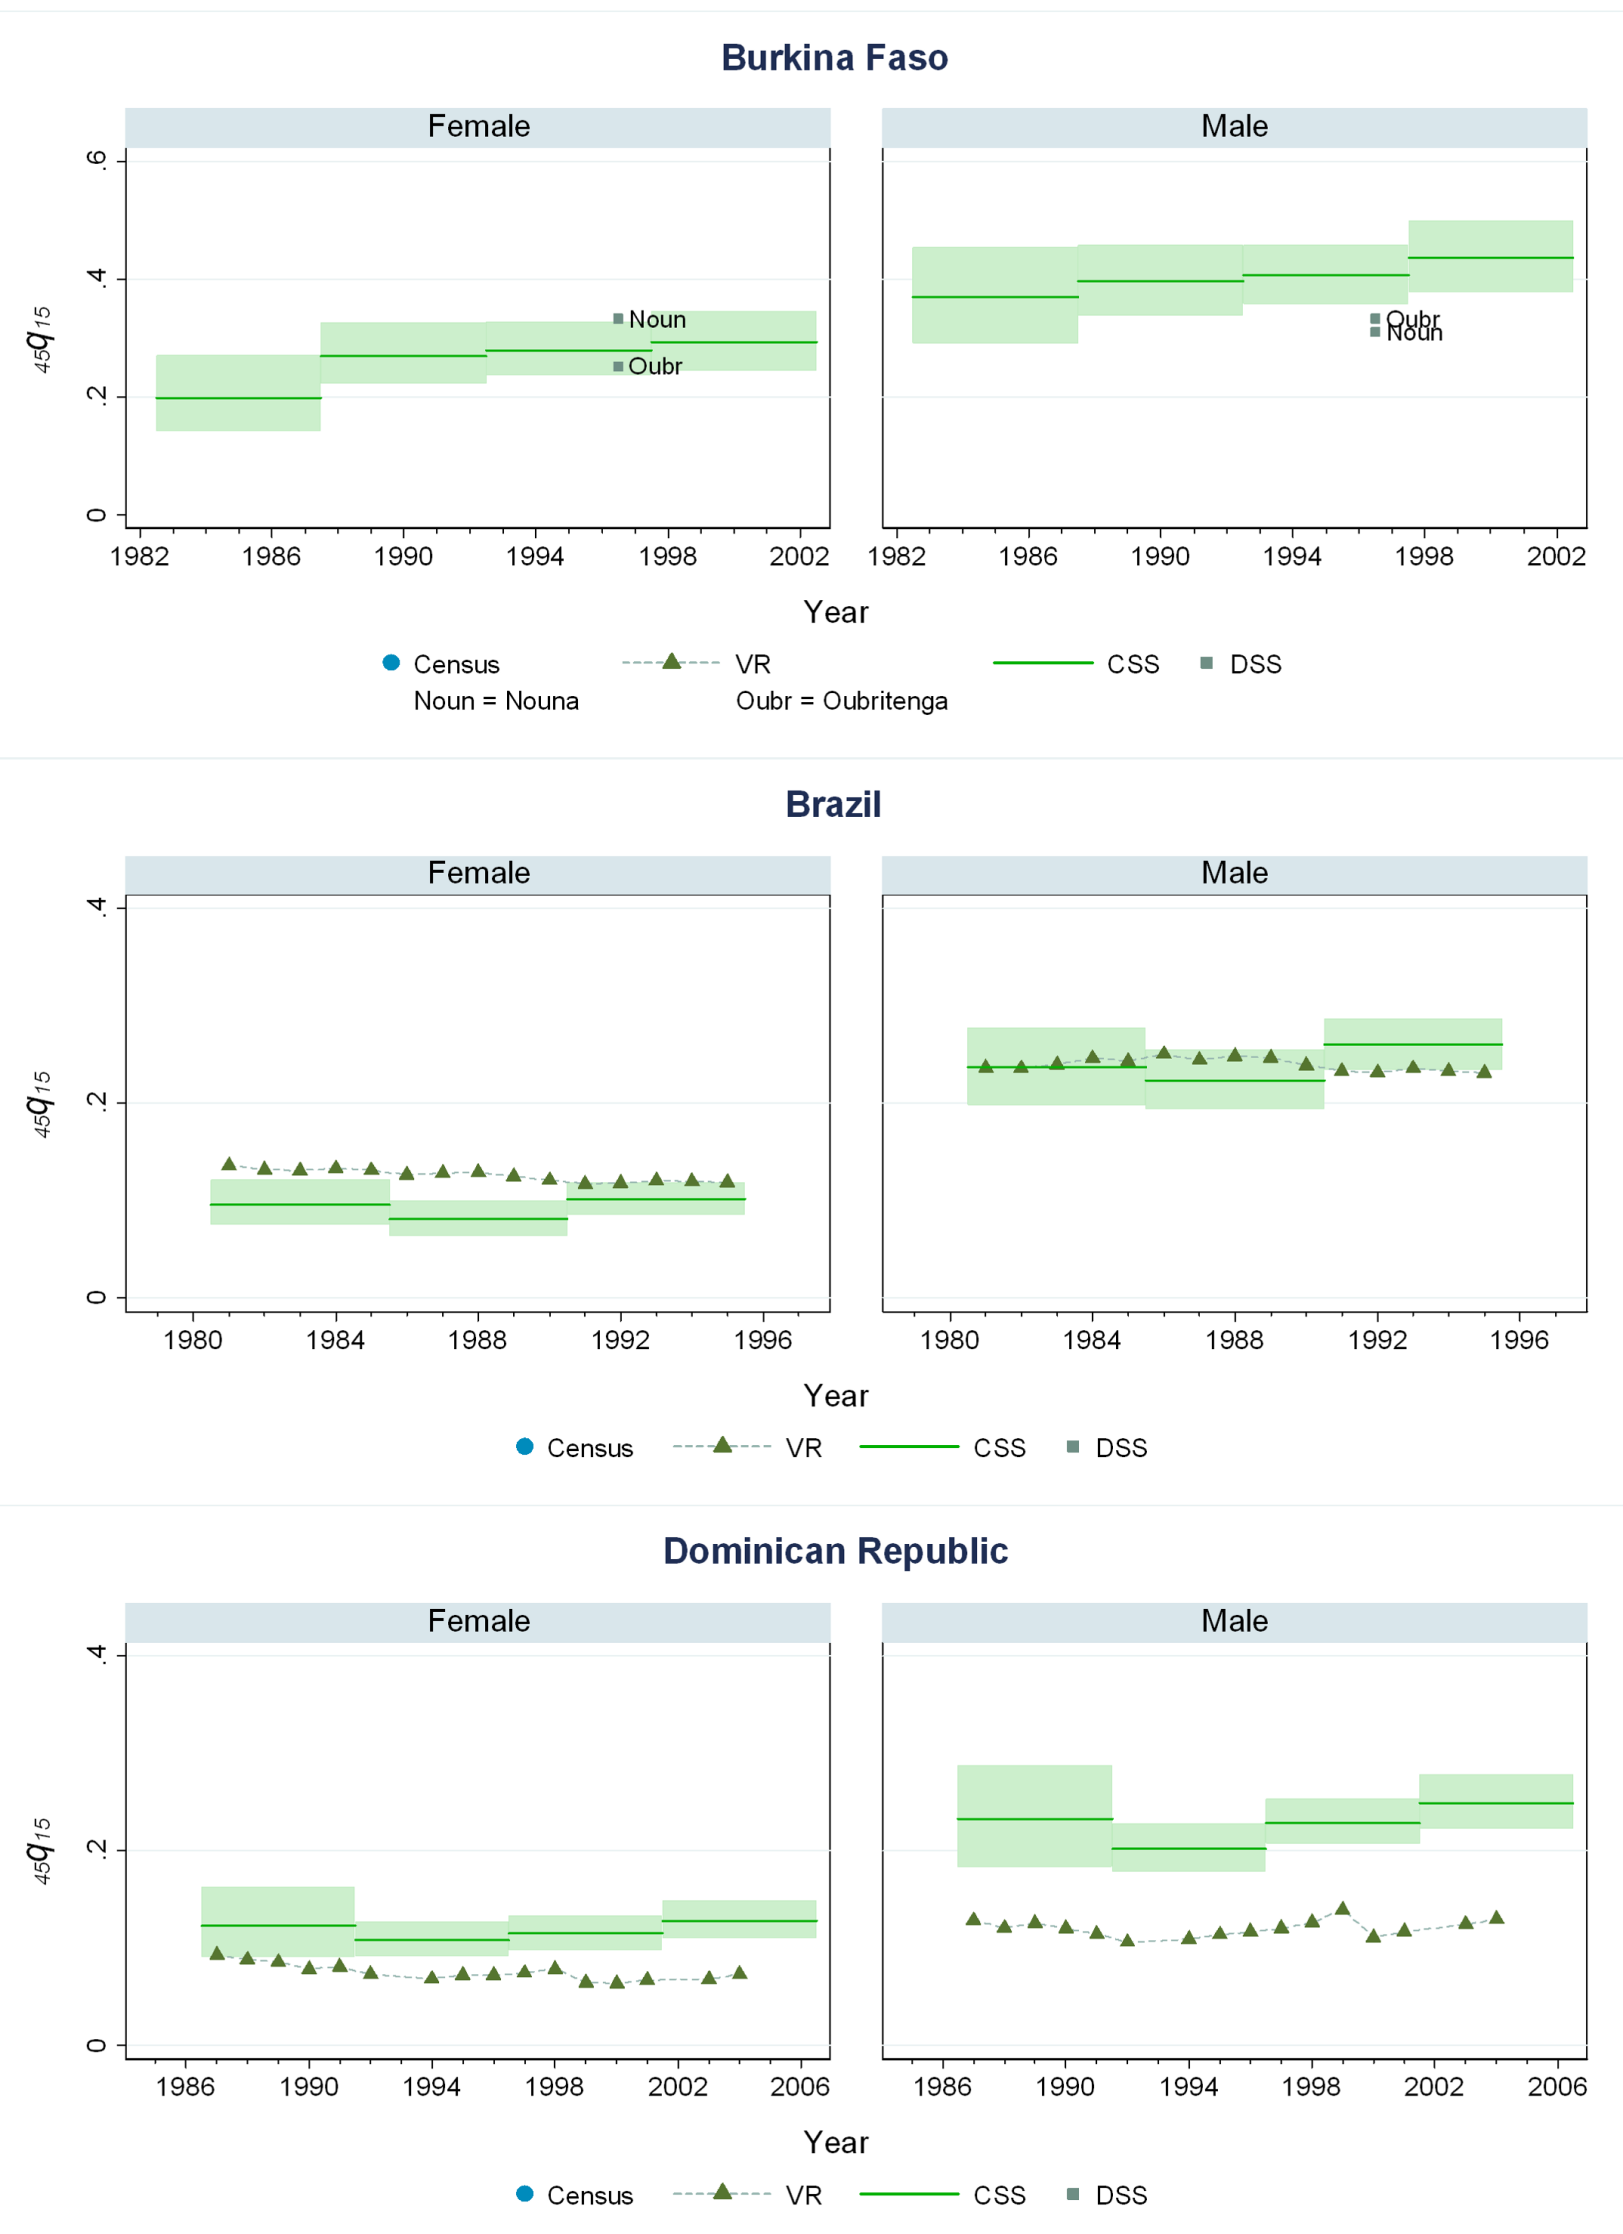 Estimates of <sub>45</sub><i>q</i><sub>15</sub> from the CSS method compared to estimates generated from vital registration, DSS, and census household death estimates: Burkina Faso, Brazil, Dominican Republic.